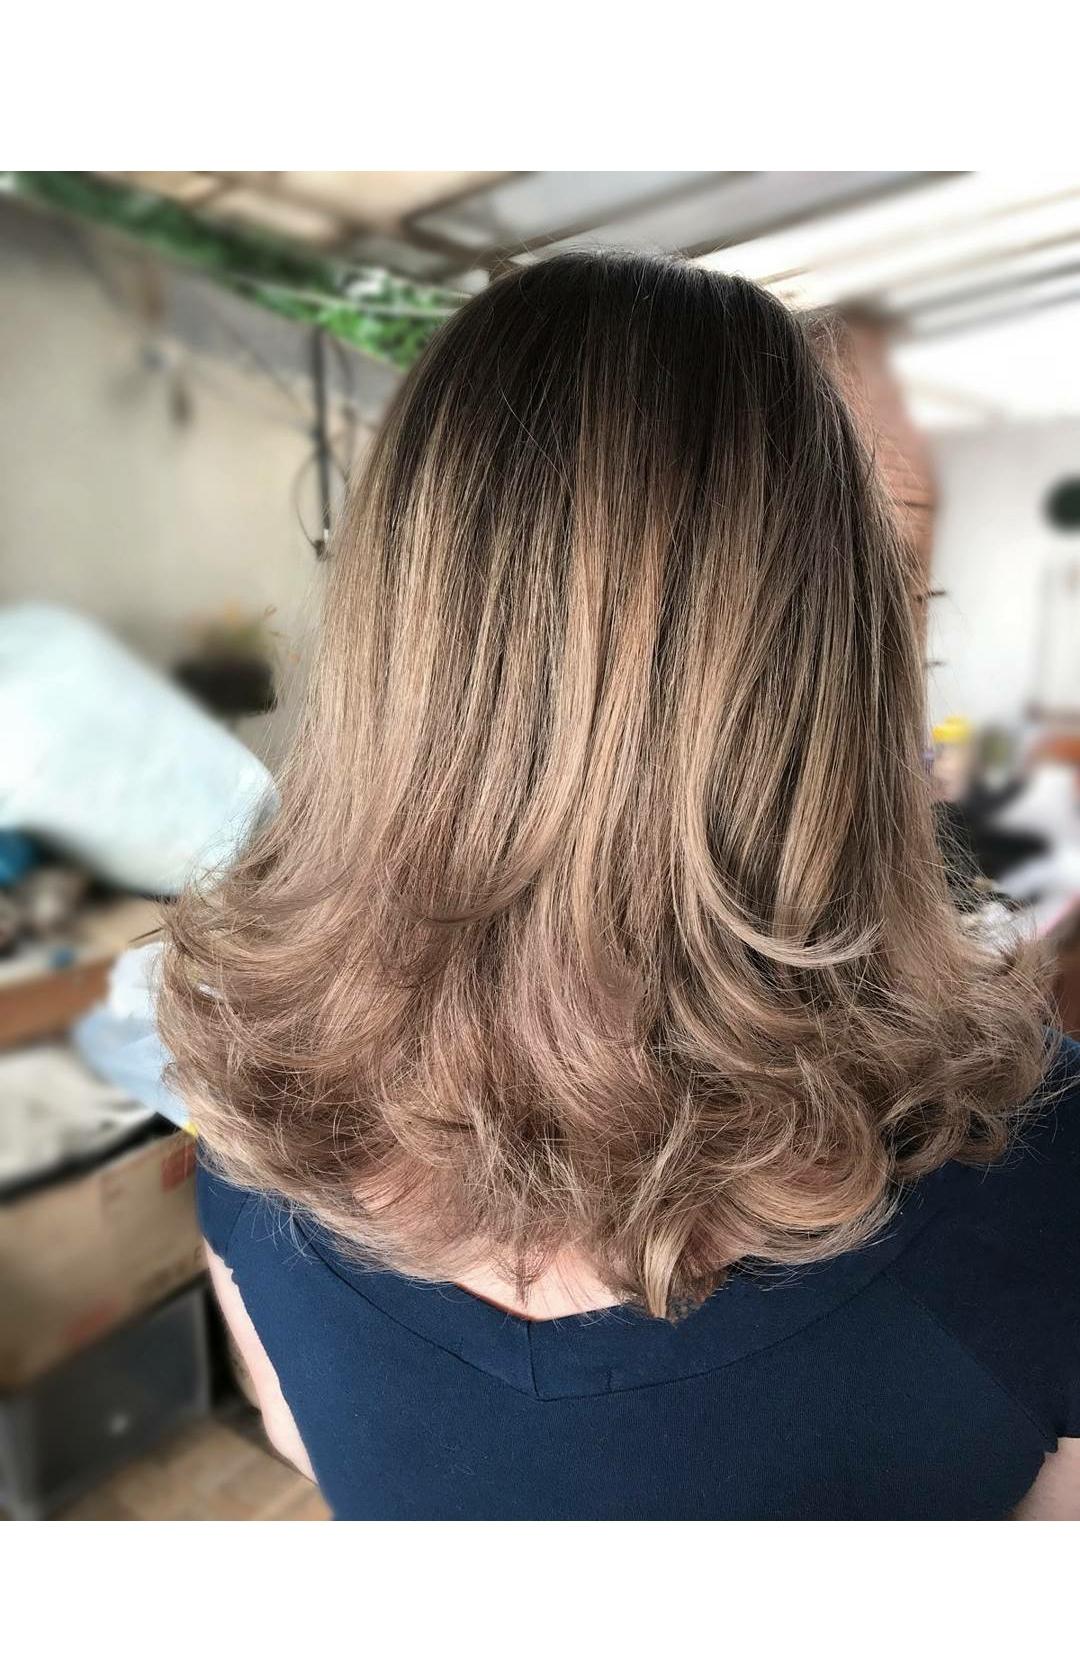 #luzes #ombrehair #ombrehighlights #haircut #chanel #blonde #hair #loirodossonhos #job #transformation #transformacao #cabelos #cabelosloiros #loirossaudaveis #loirosdivos #loirosdourados #loirosamanteigados #loirosperolados #loirosplatinados #corte cabelo cabeleireiro(a) maquiador(a) designer de sobrancelhas